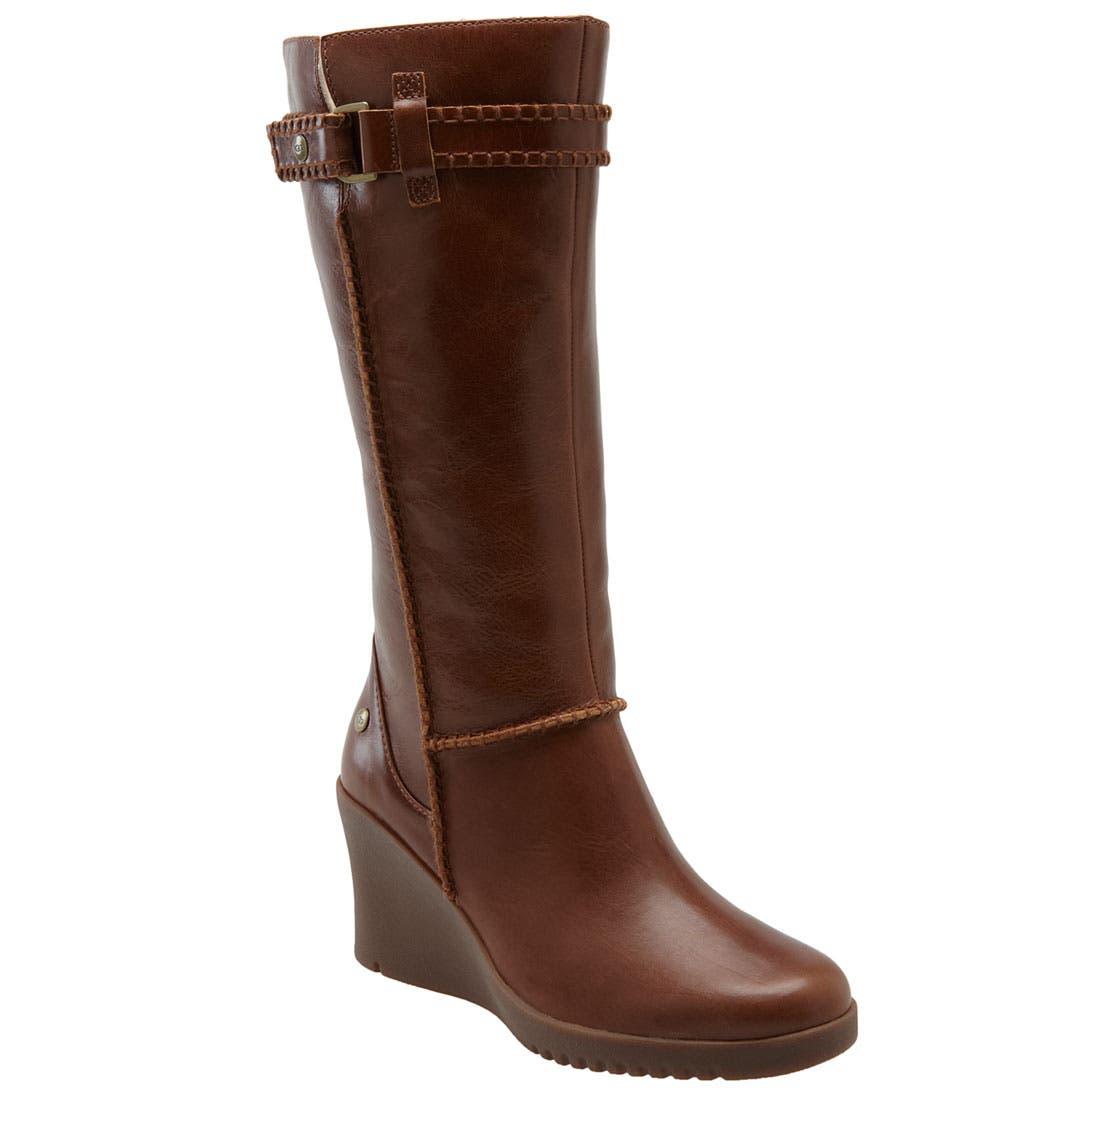 Main Image - UGG® Australia 'Maxene' Wedge Boot (Women)